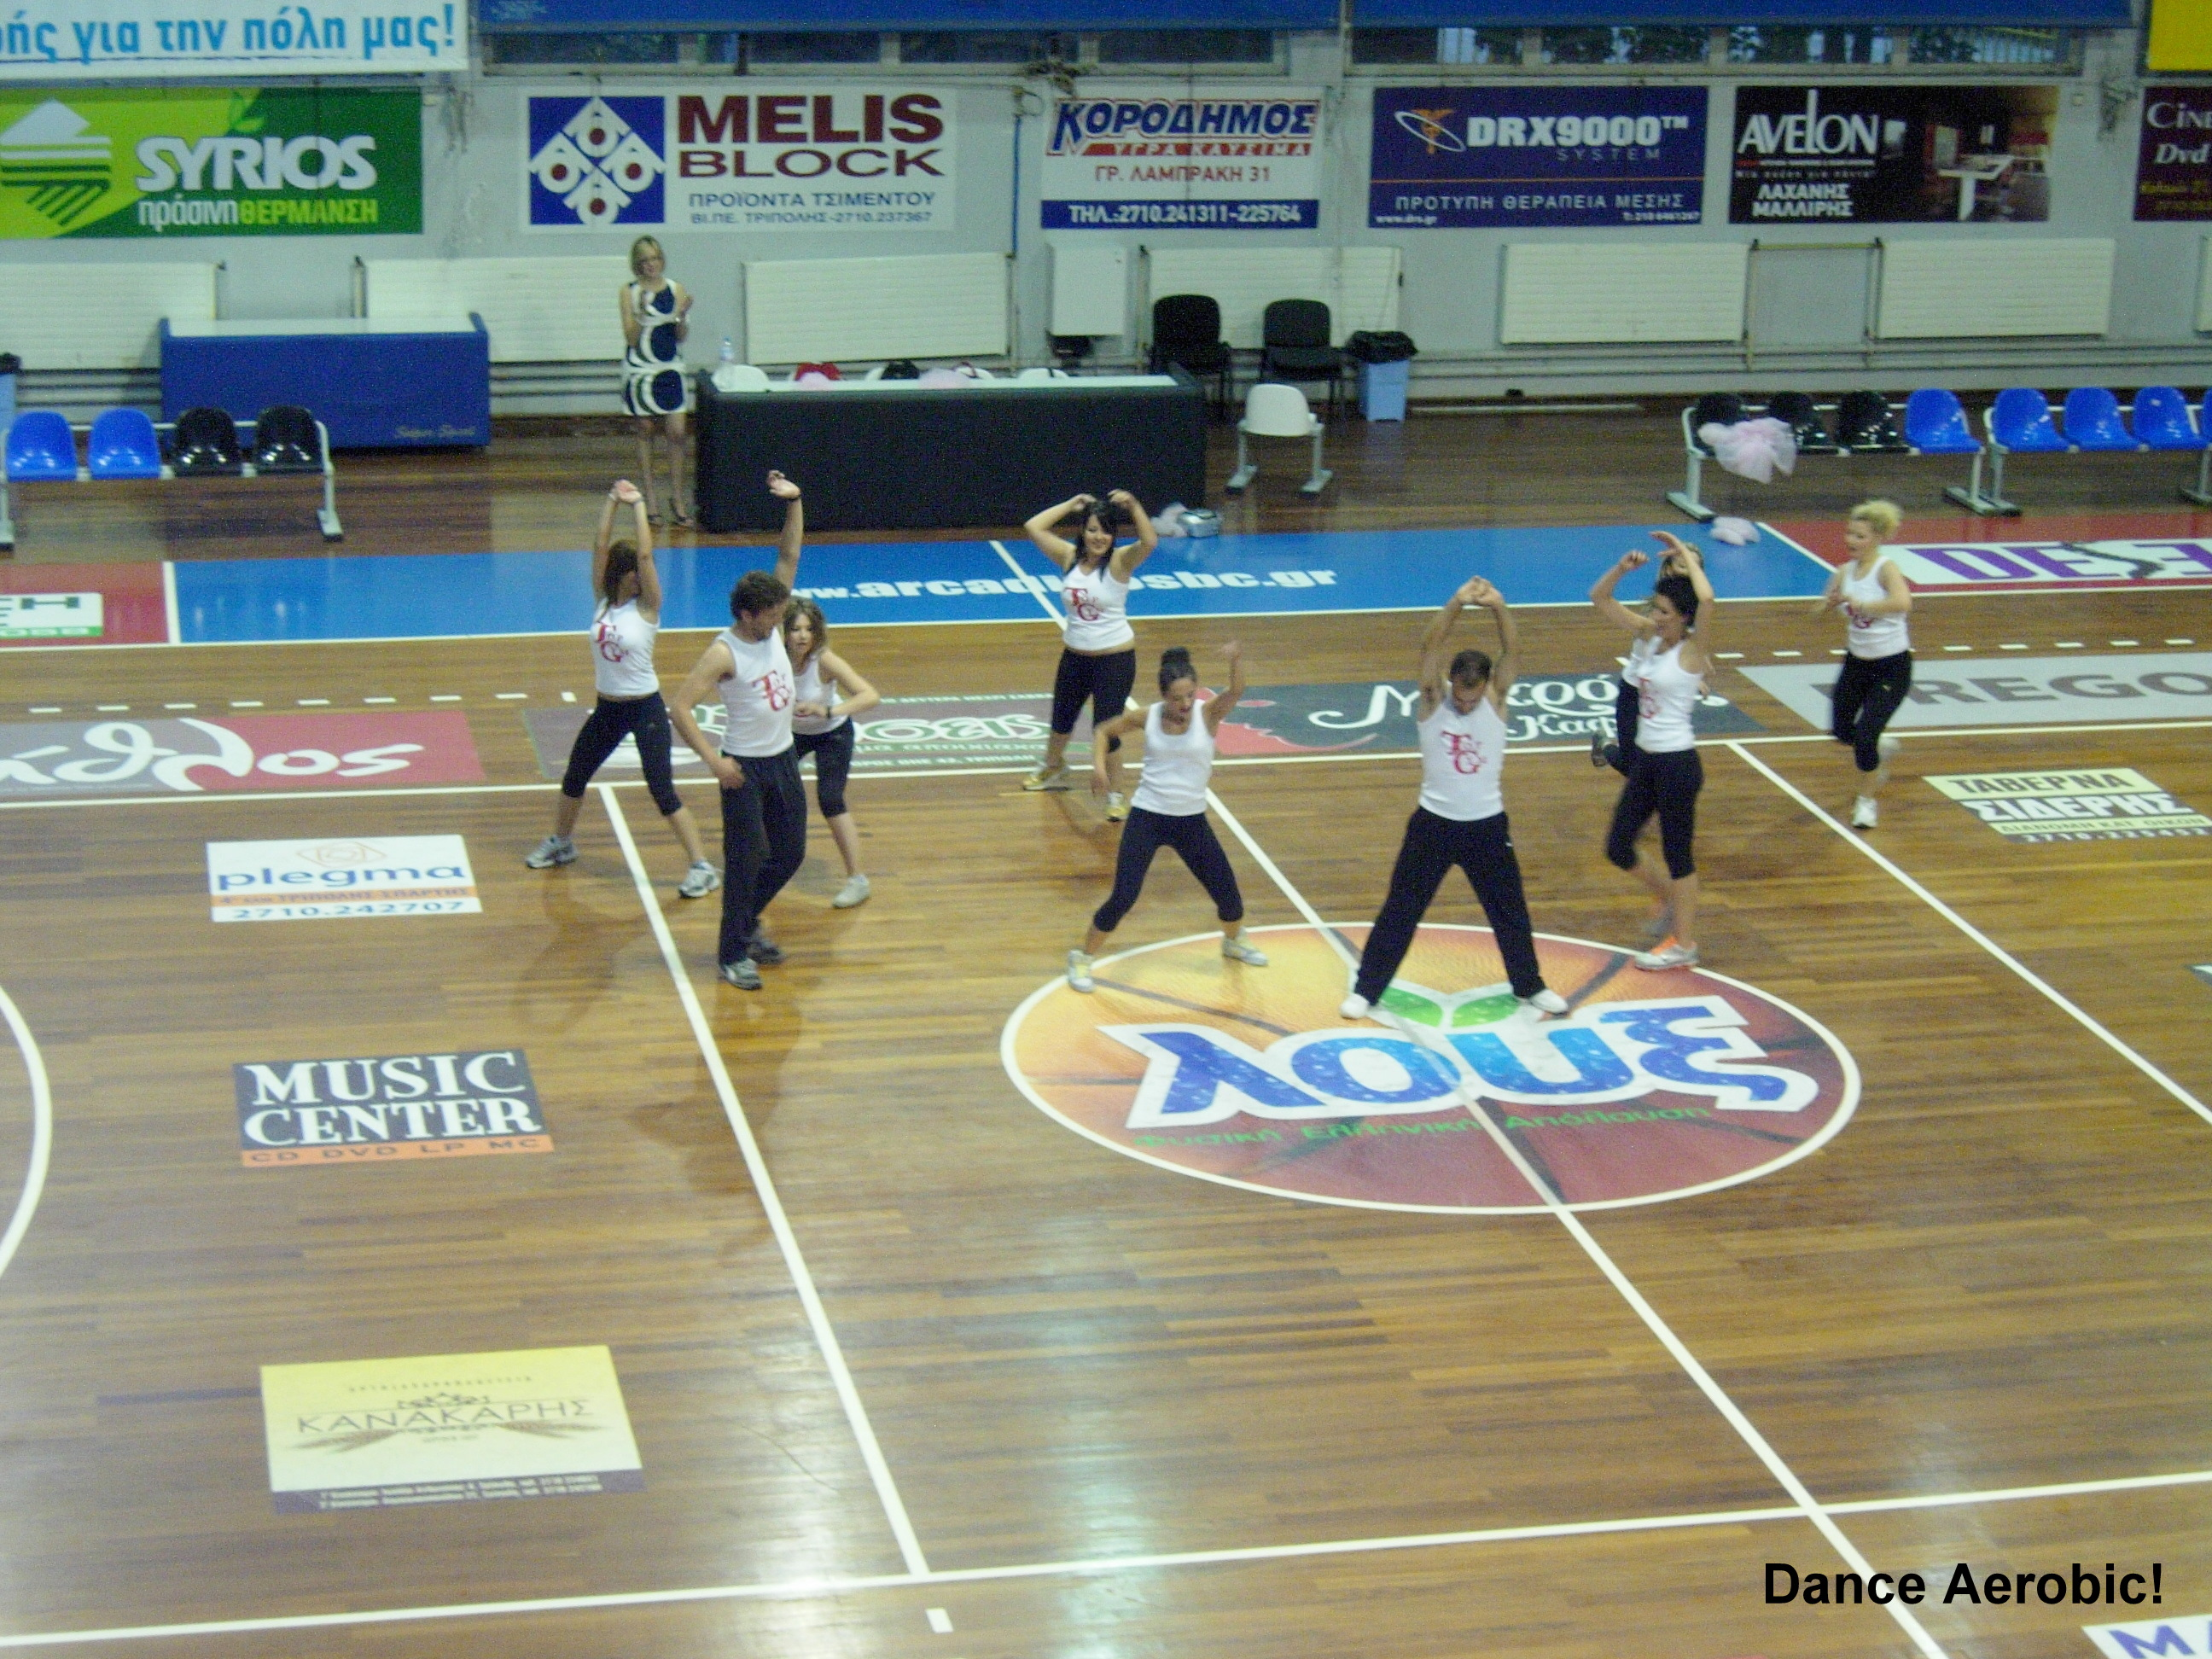 DANCE AEROBIC!